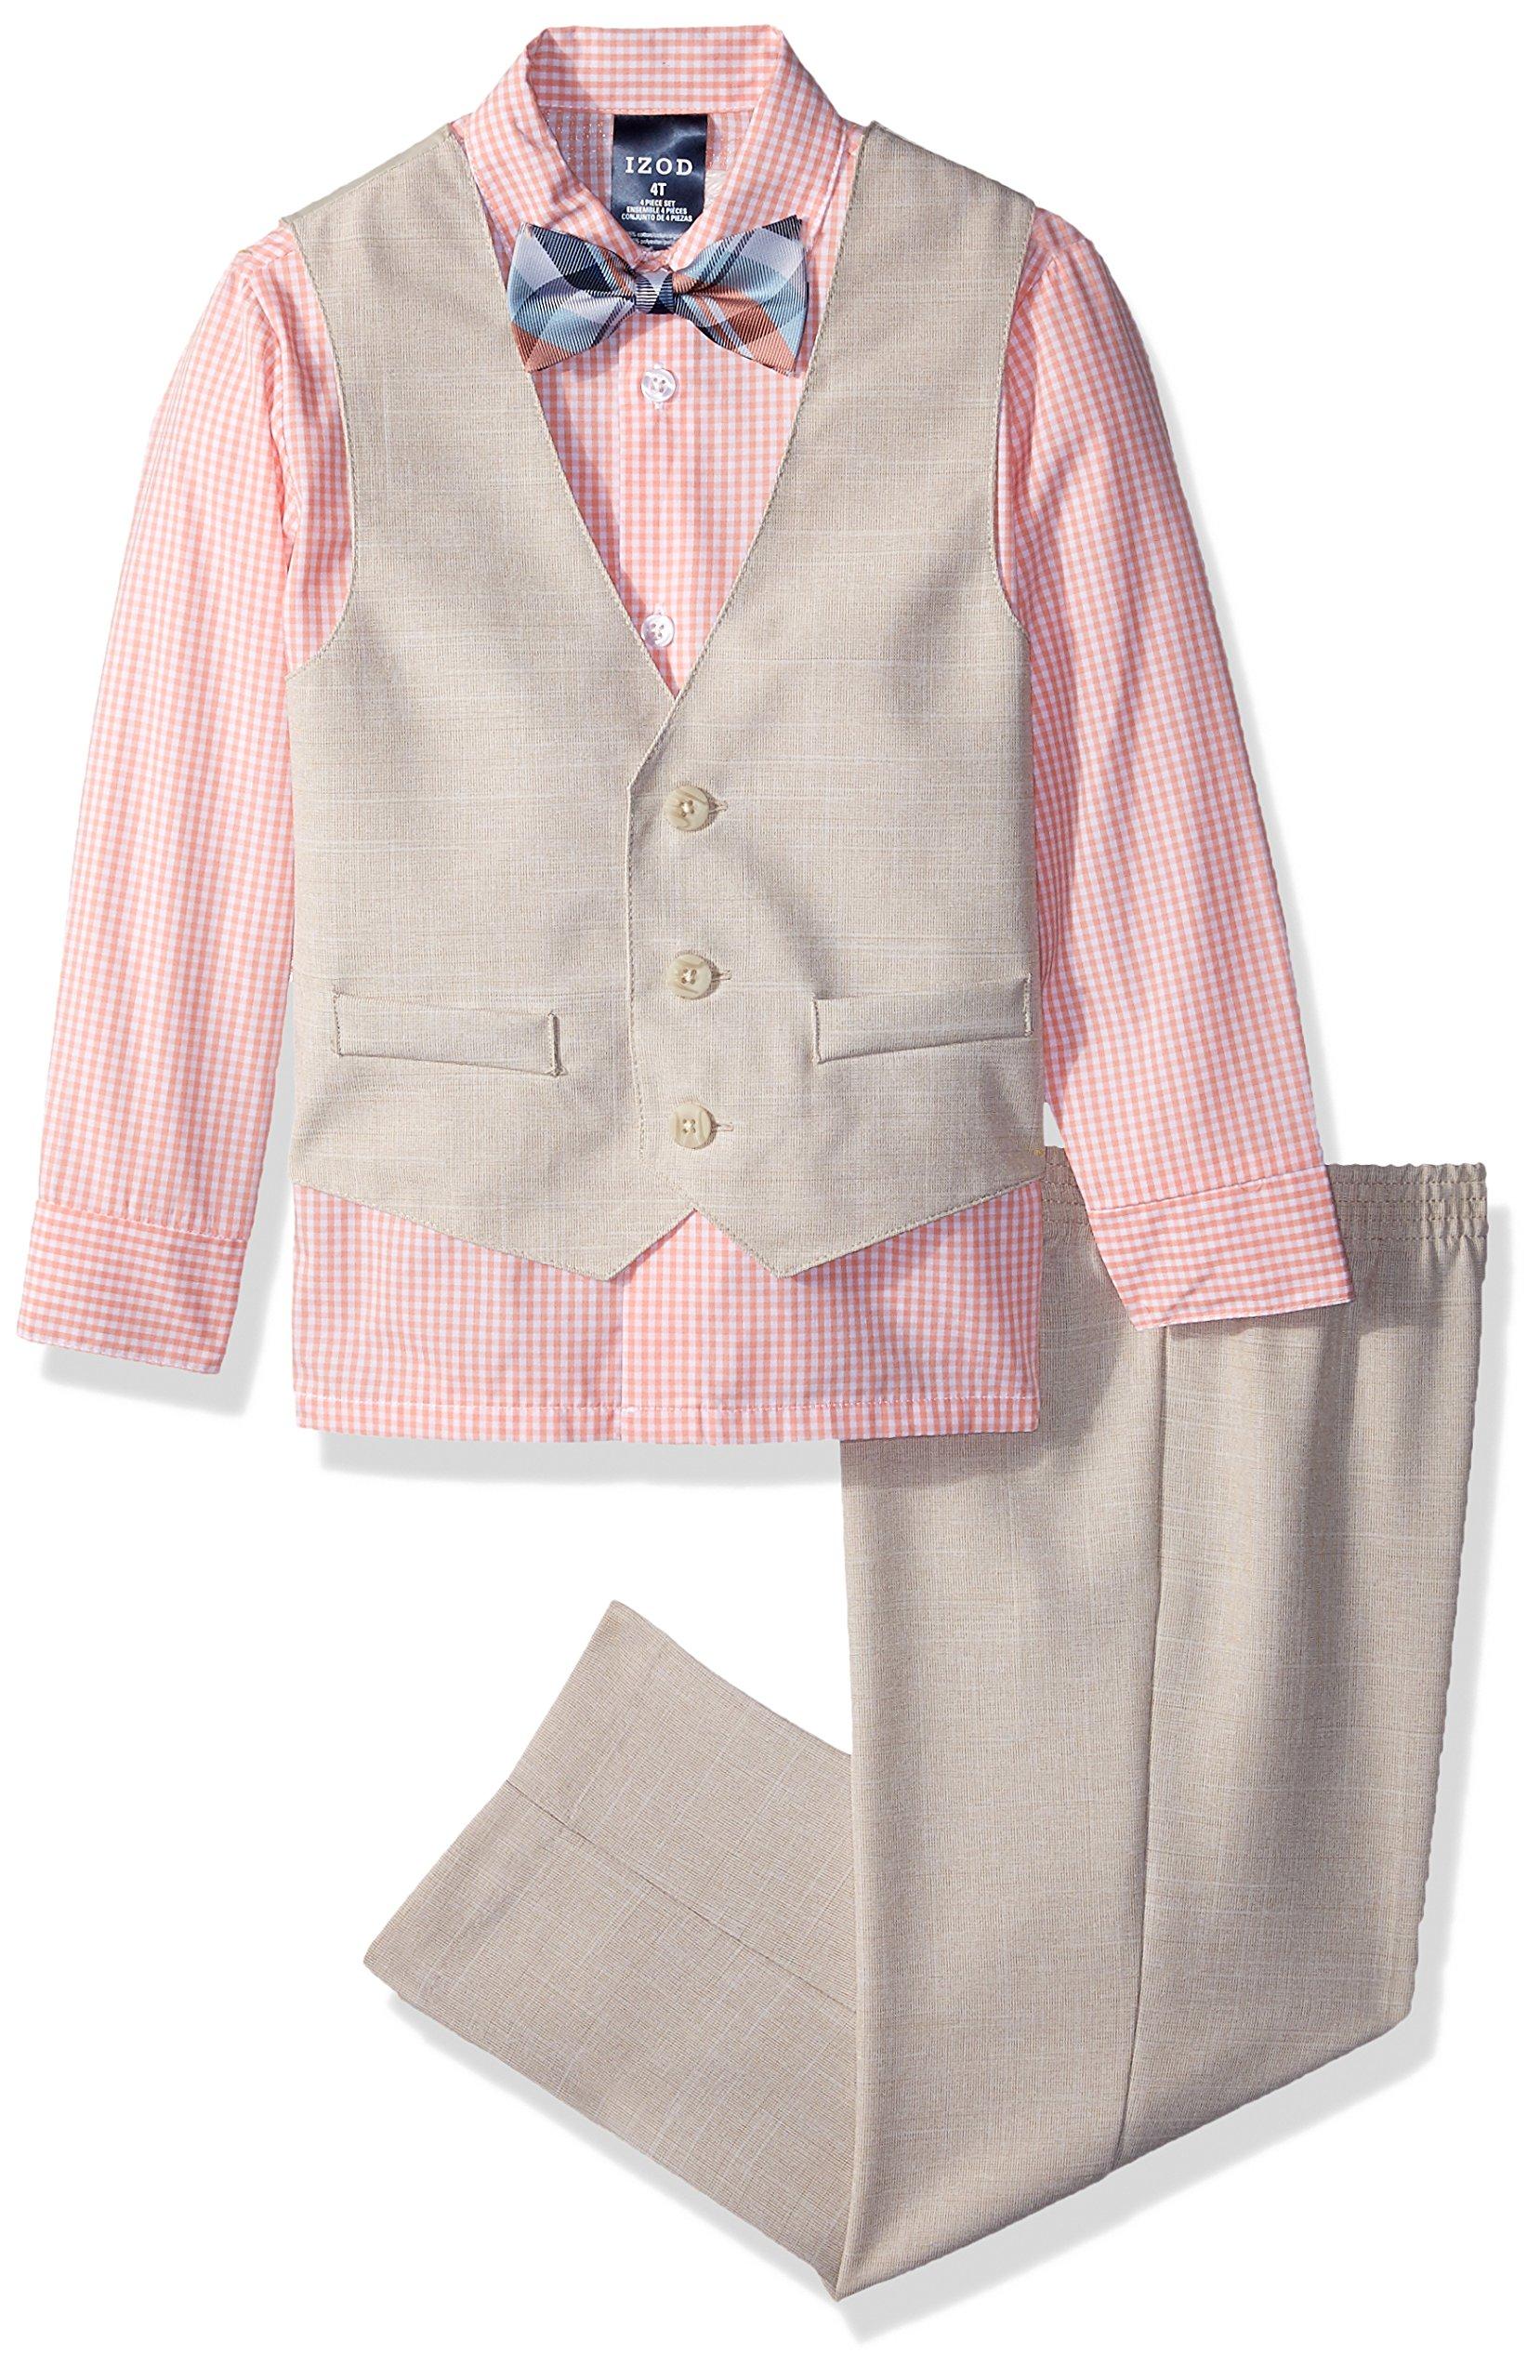 Izod boys 4-Piece Vest Set with Dress Shirt, Bow Tie, Pants, and Vest, Papaya Punch, 3T